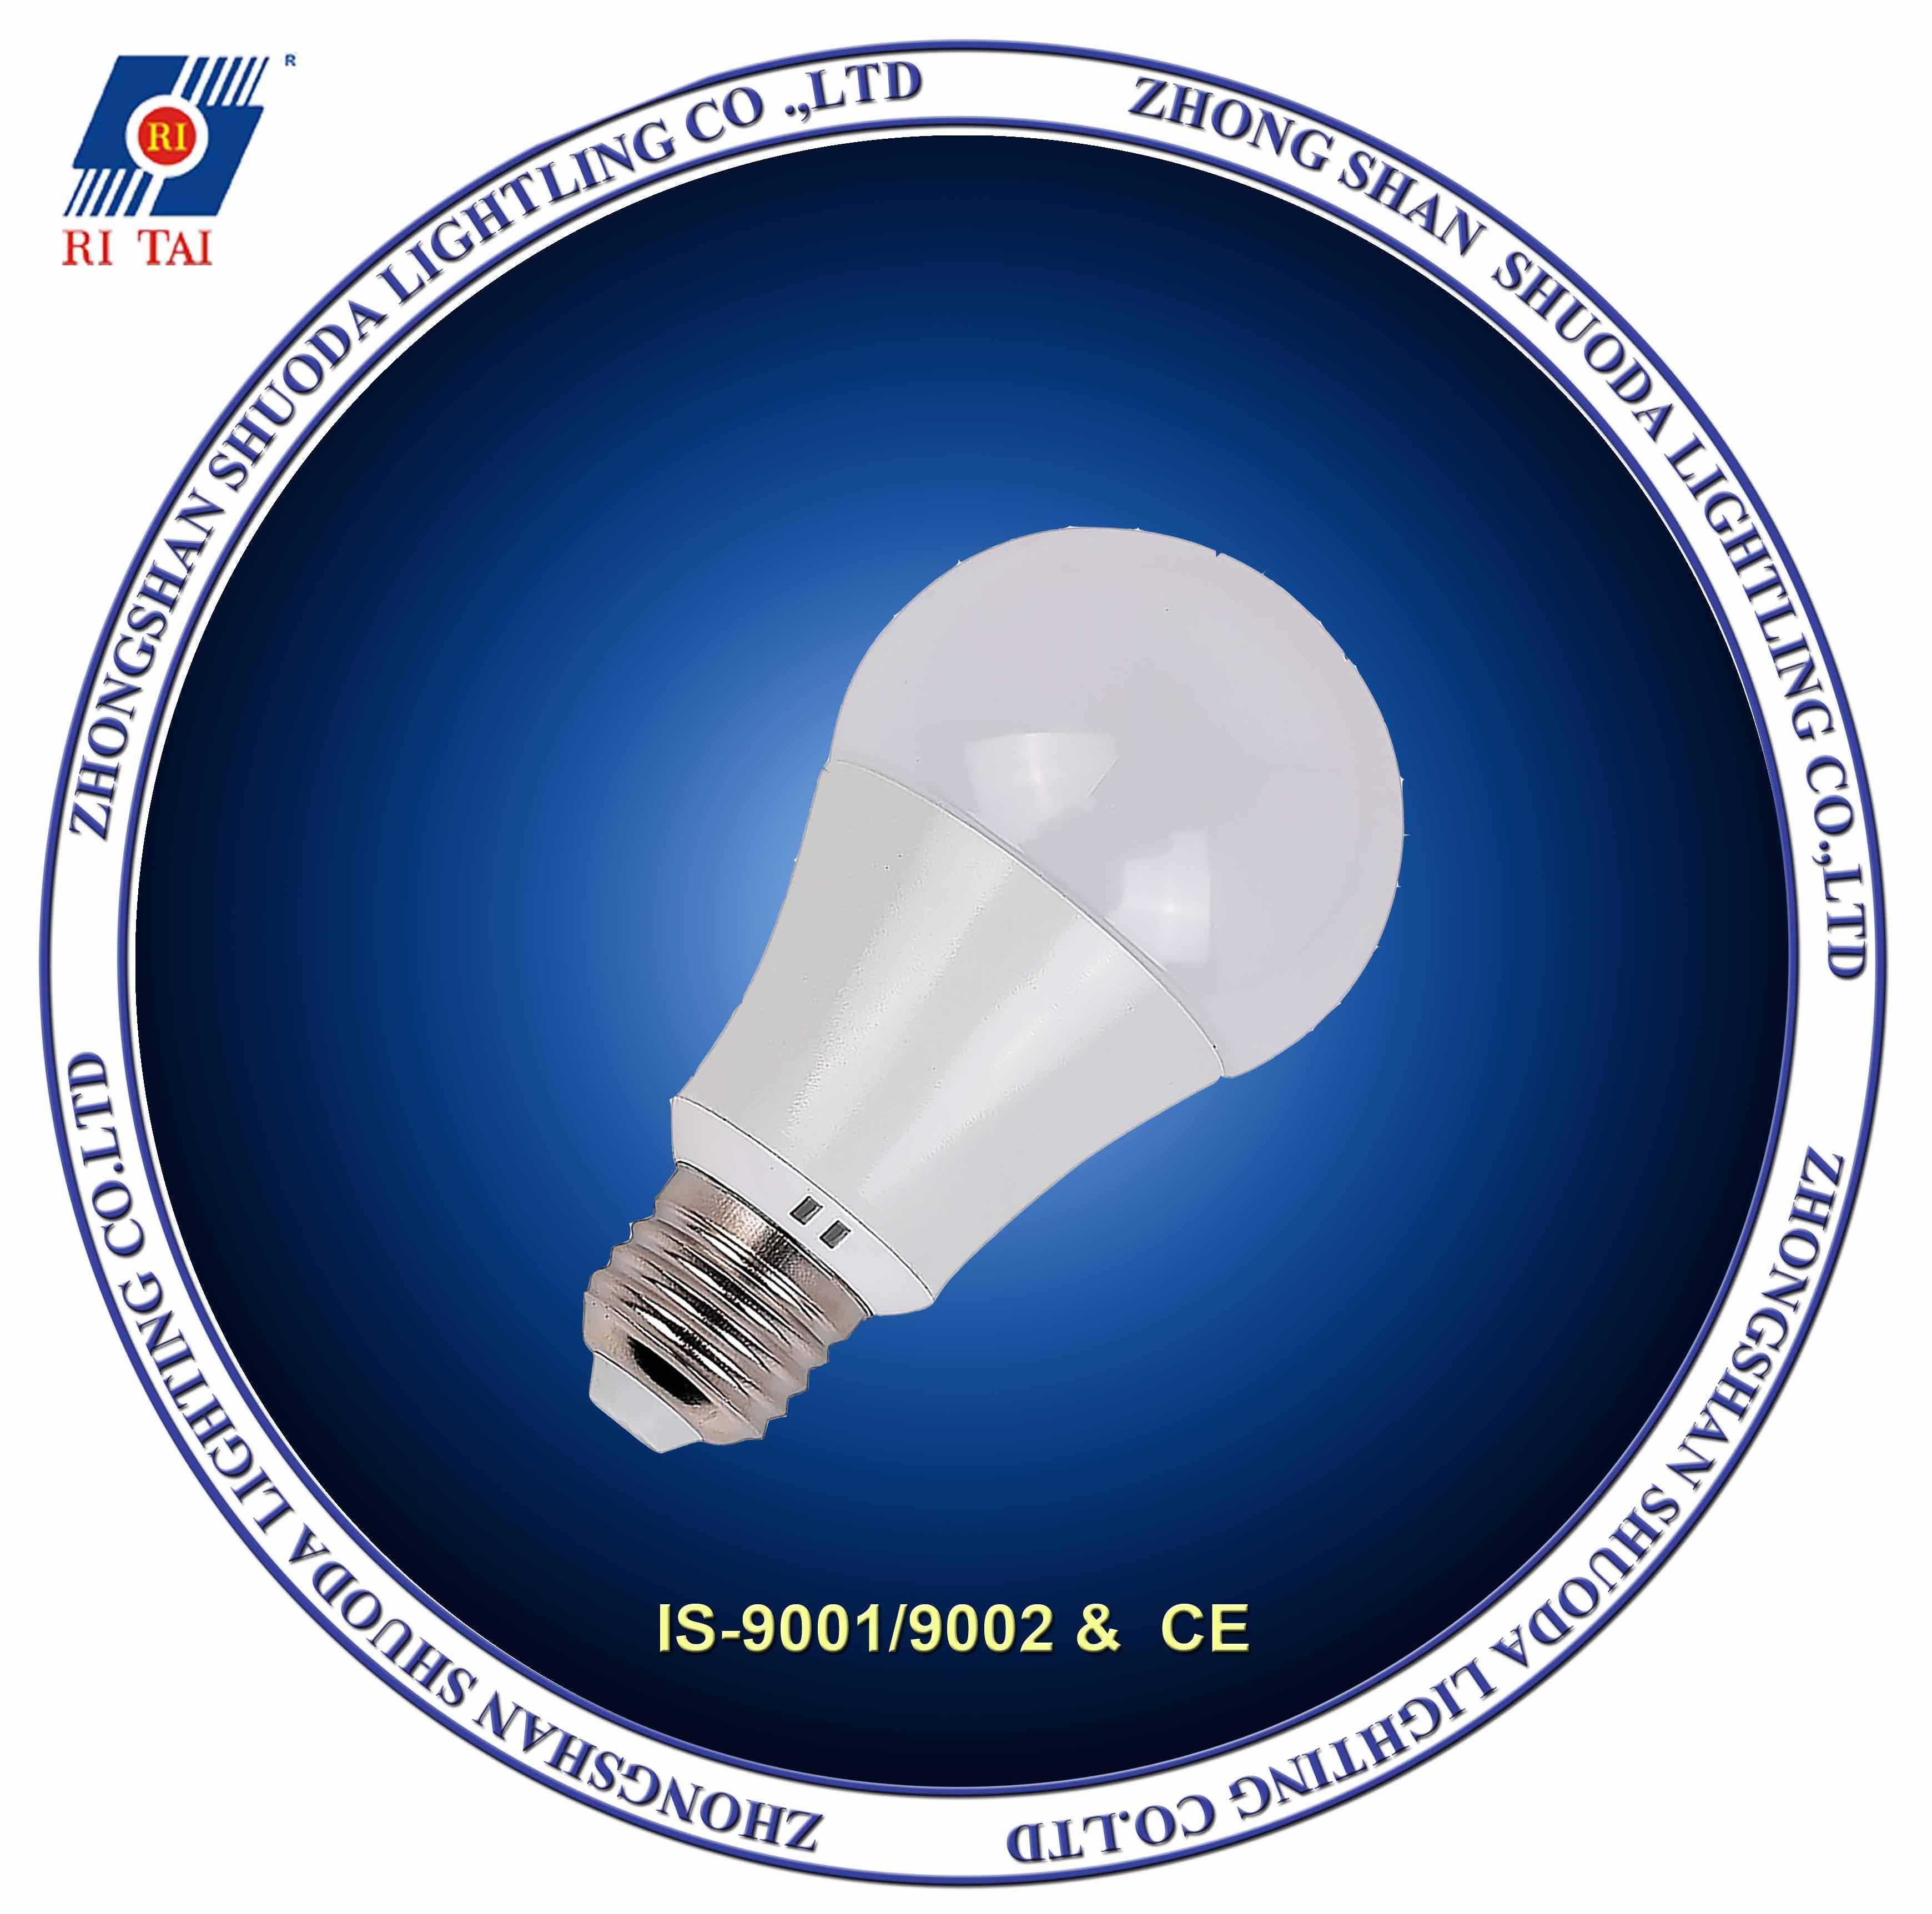 LED BULB BL6455 3W&5W&7W&9W